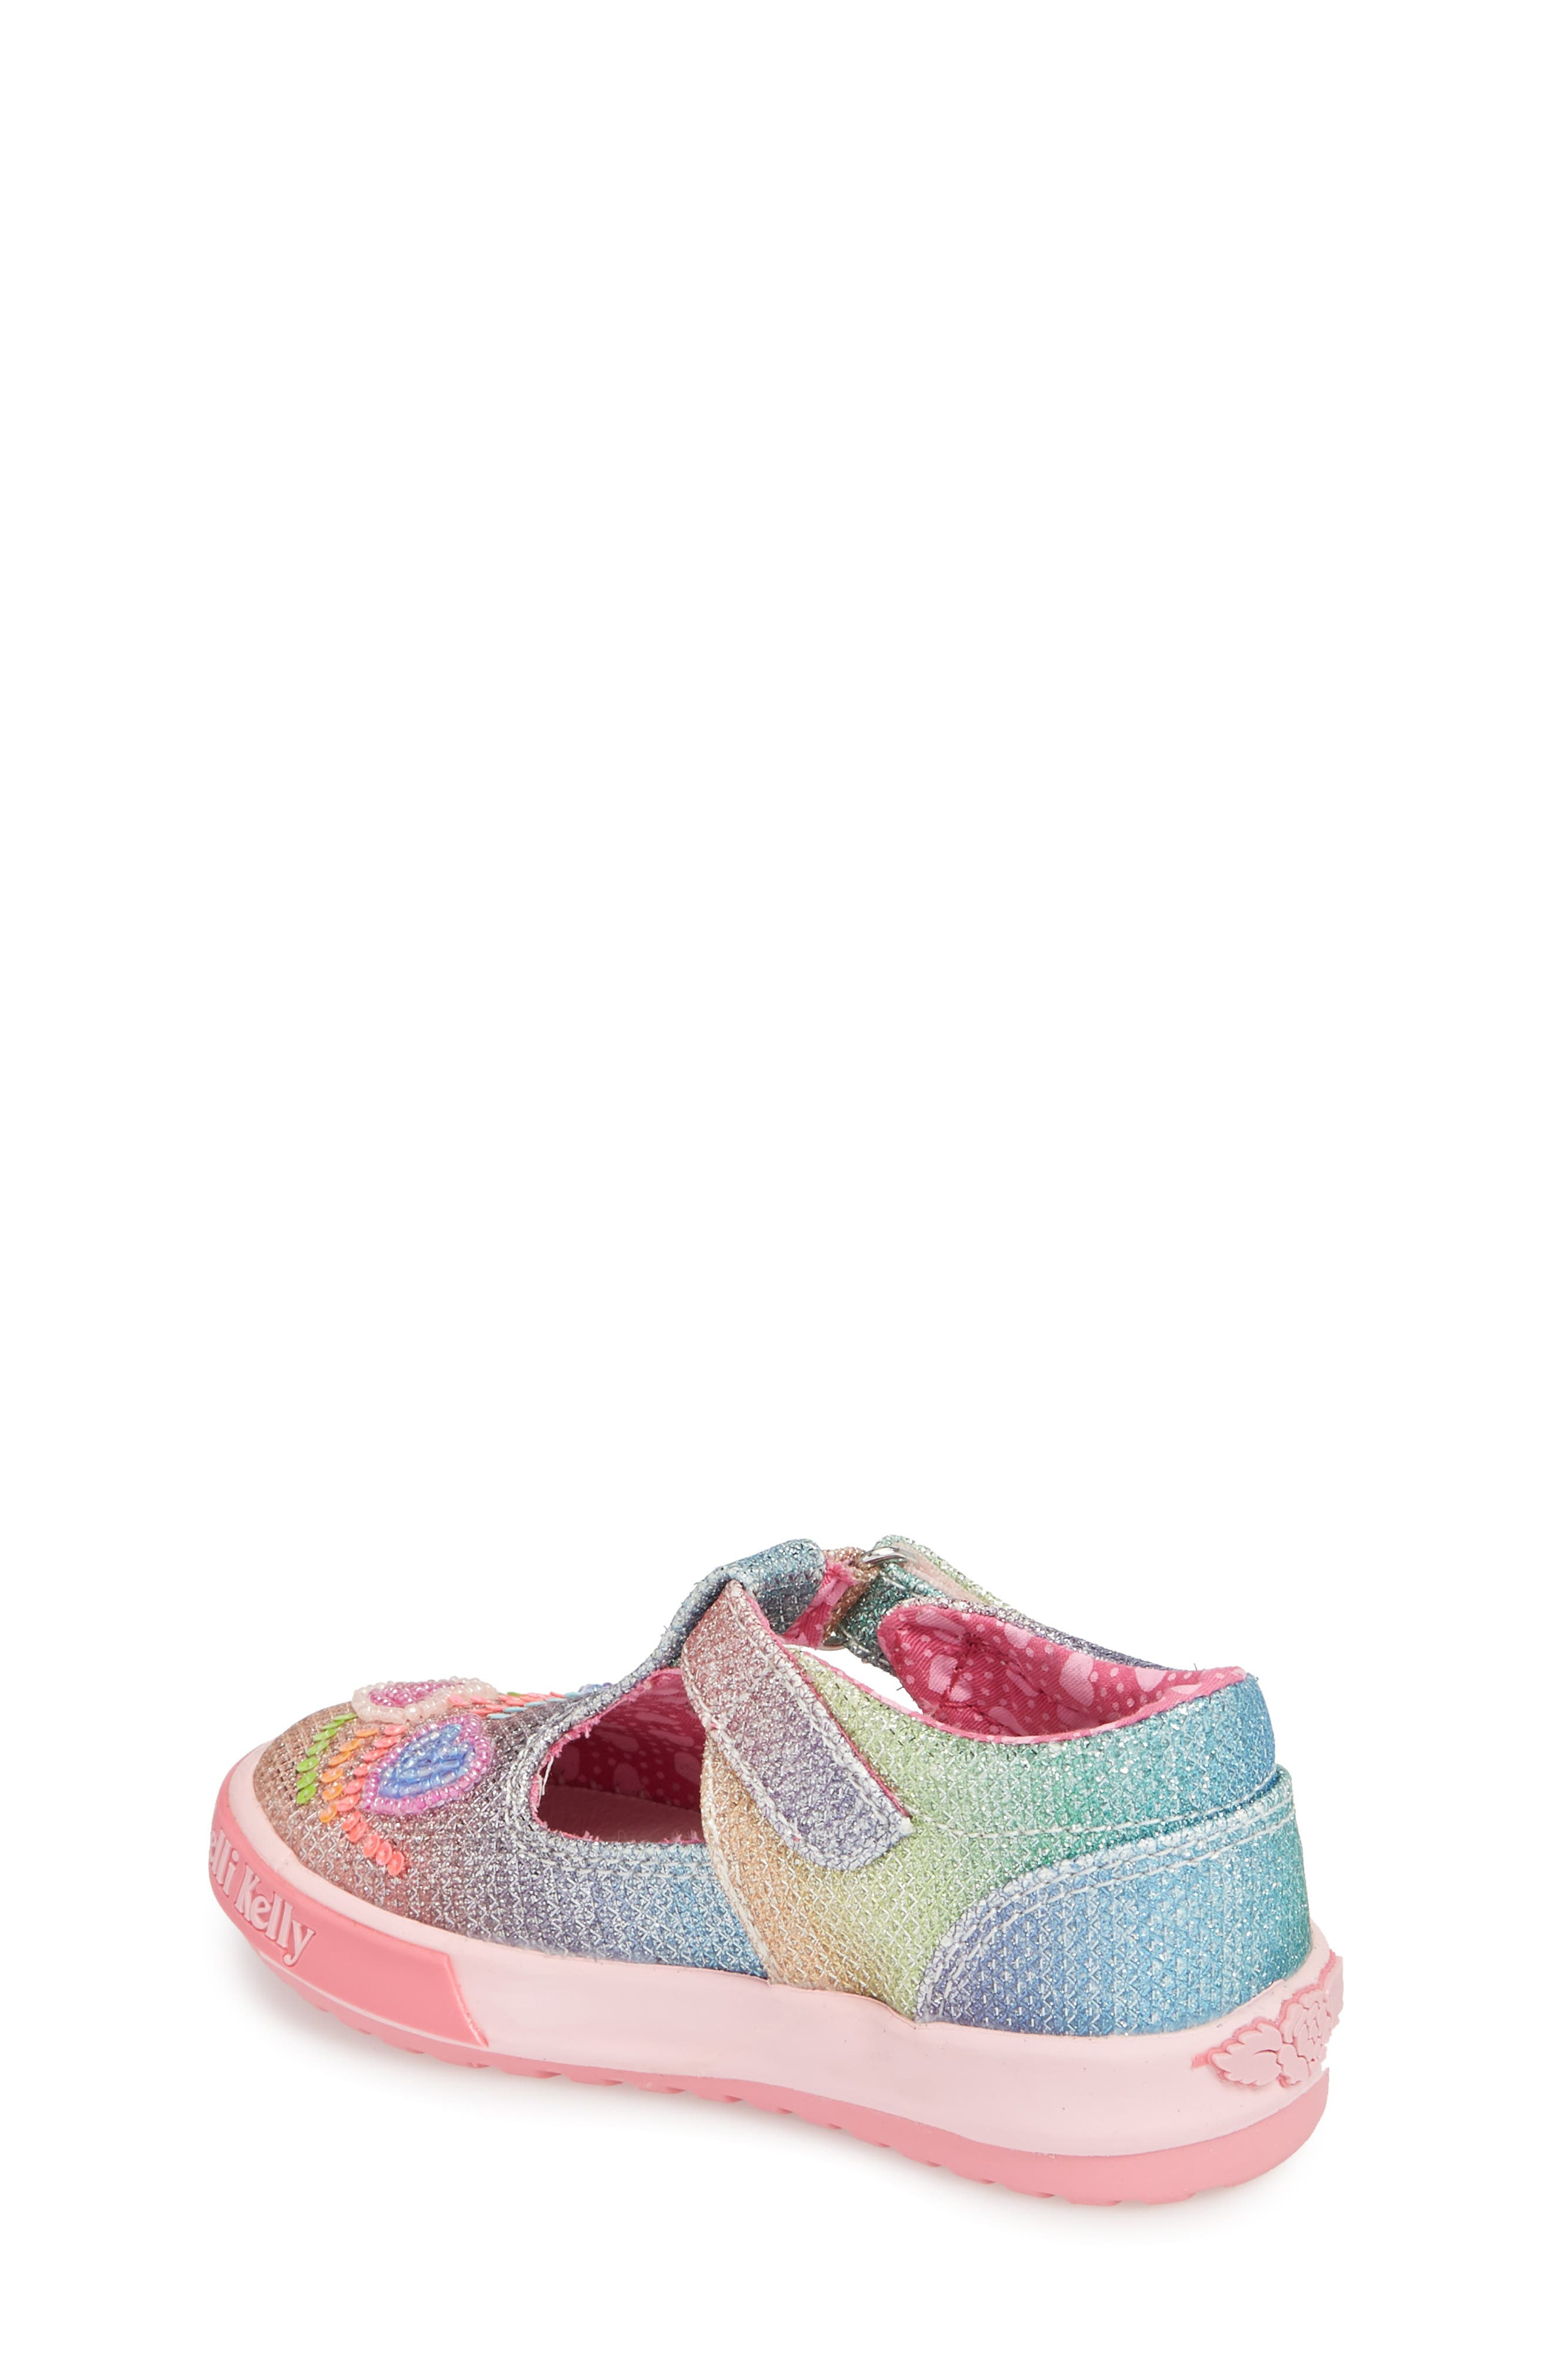 LELLI KELLY,                             Glitter Metallic T-Strap Mary Jane,                             Alternate thumbnail 2, color,                             320